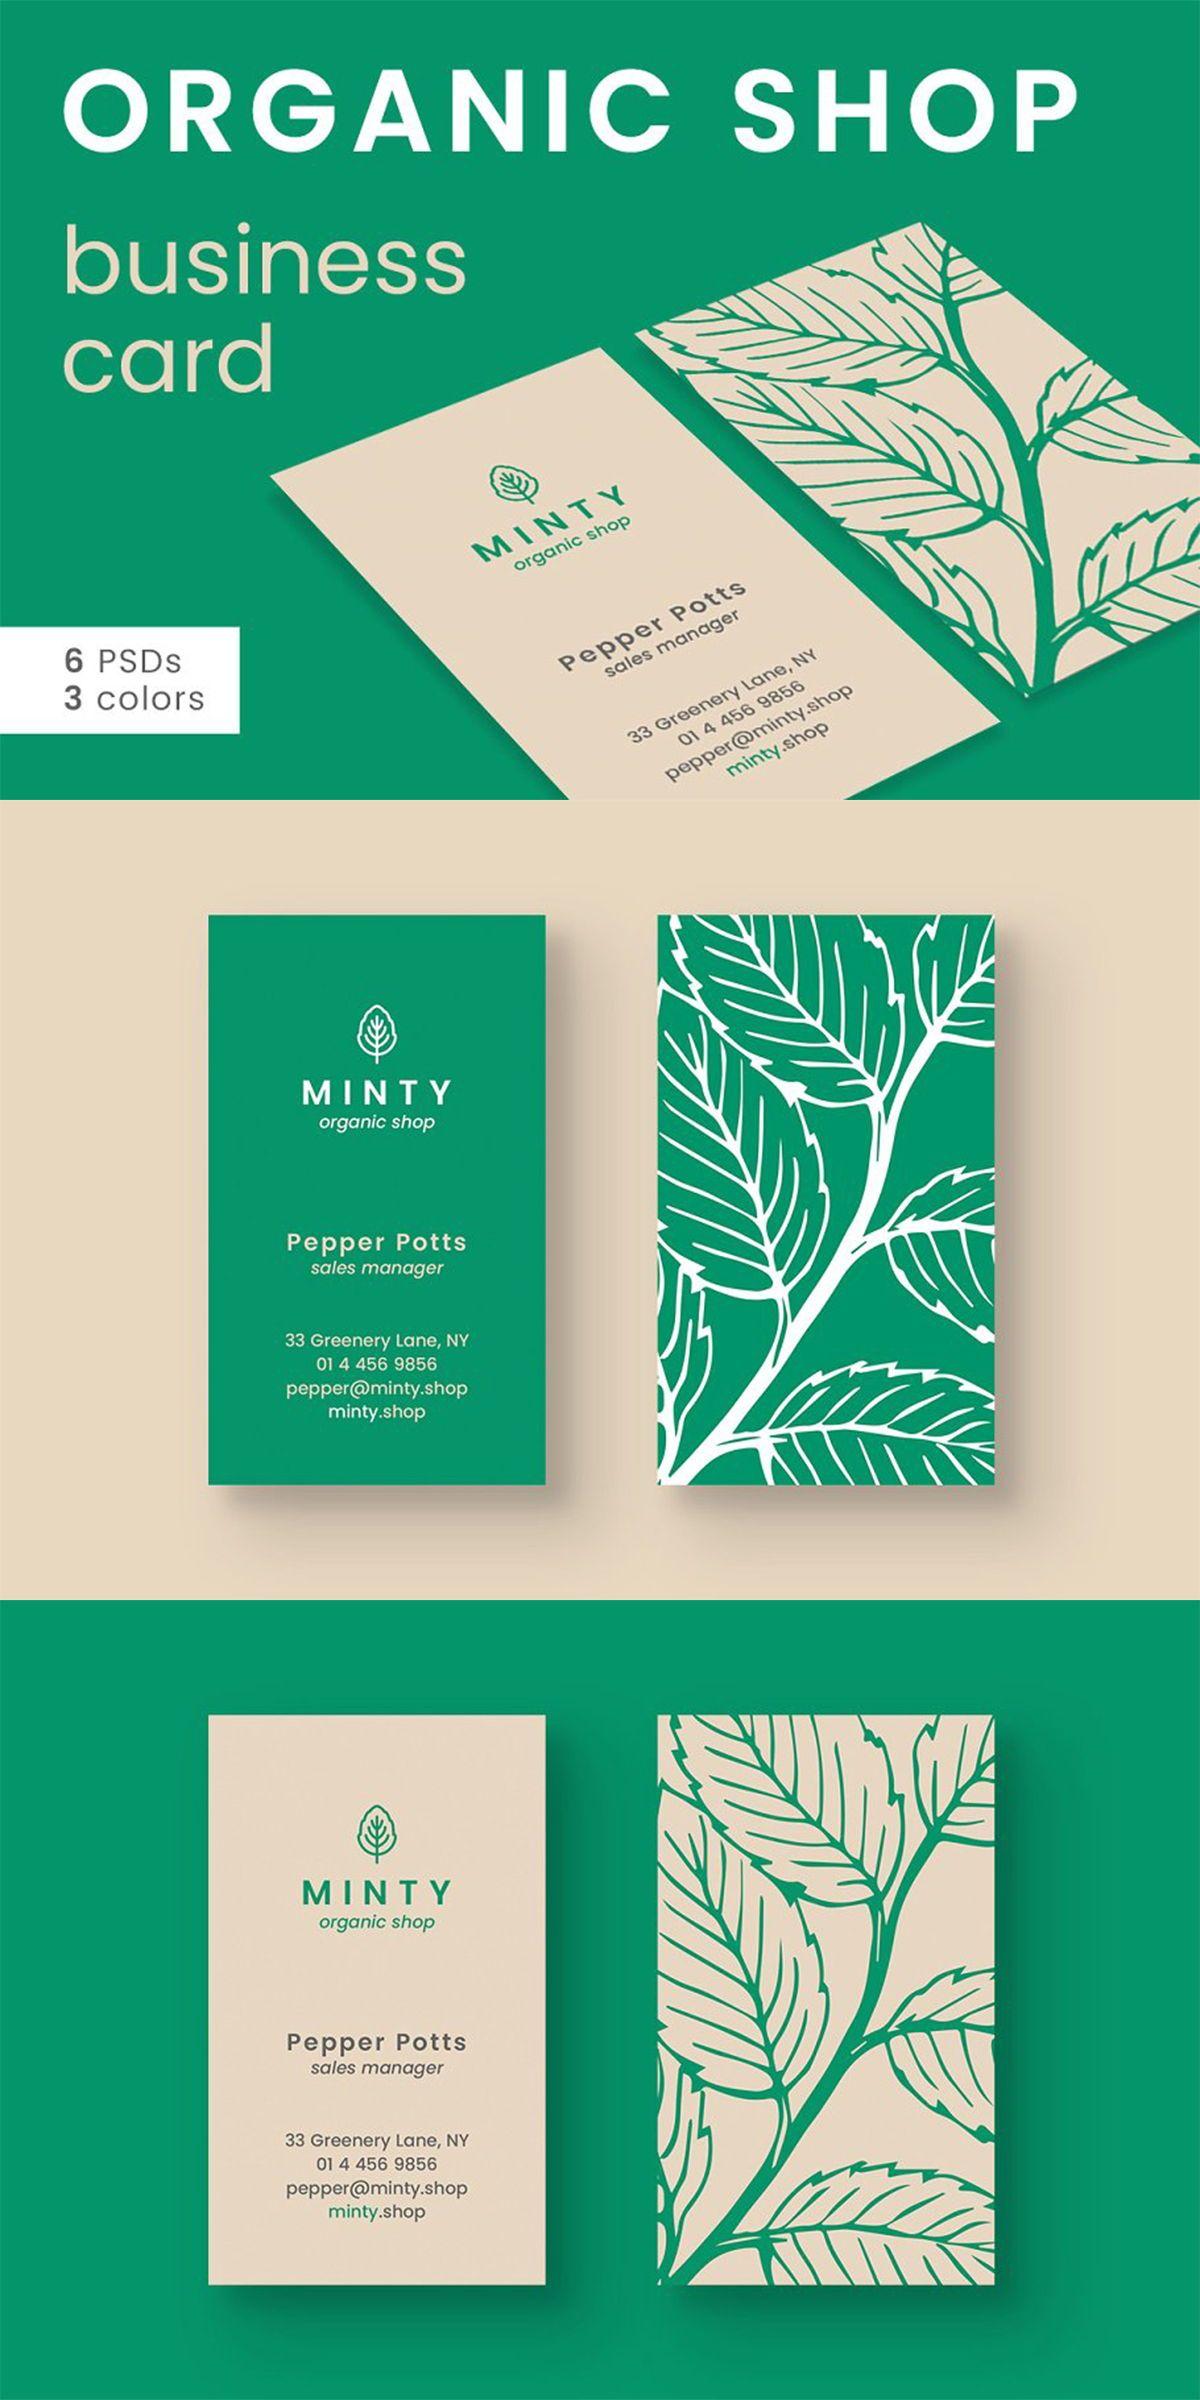 Organic Shop Business Card